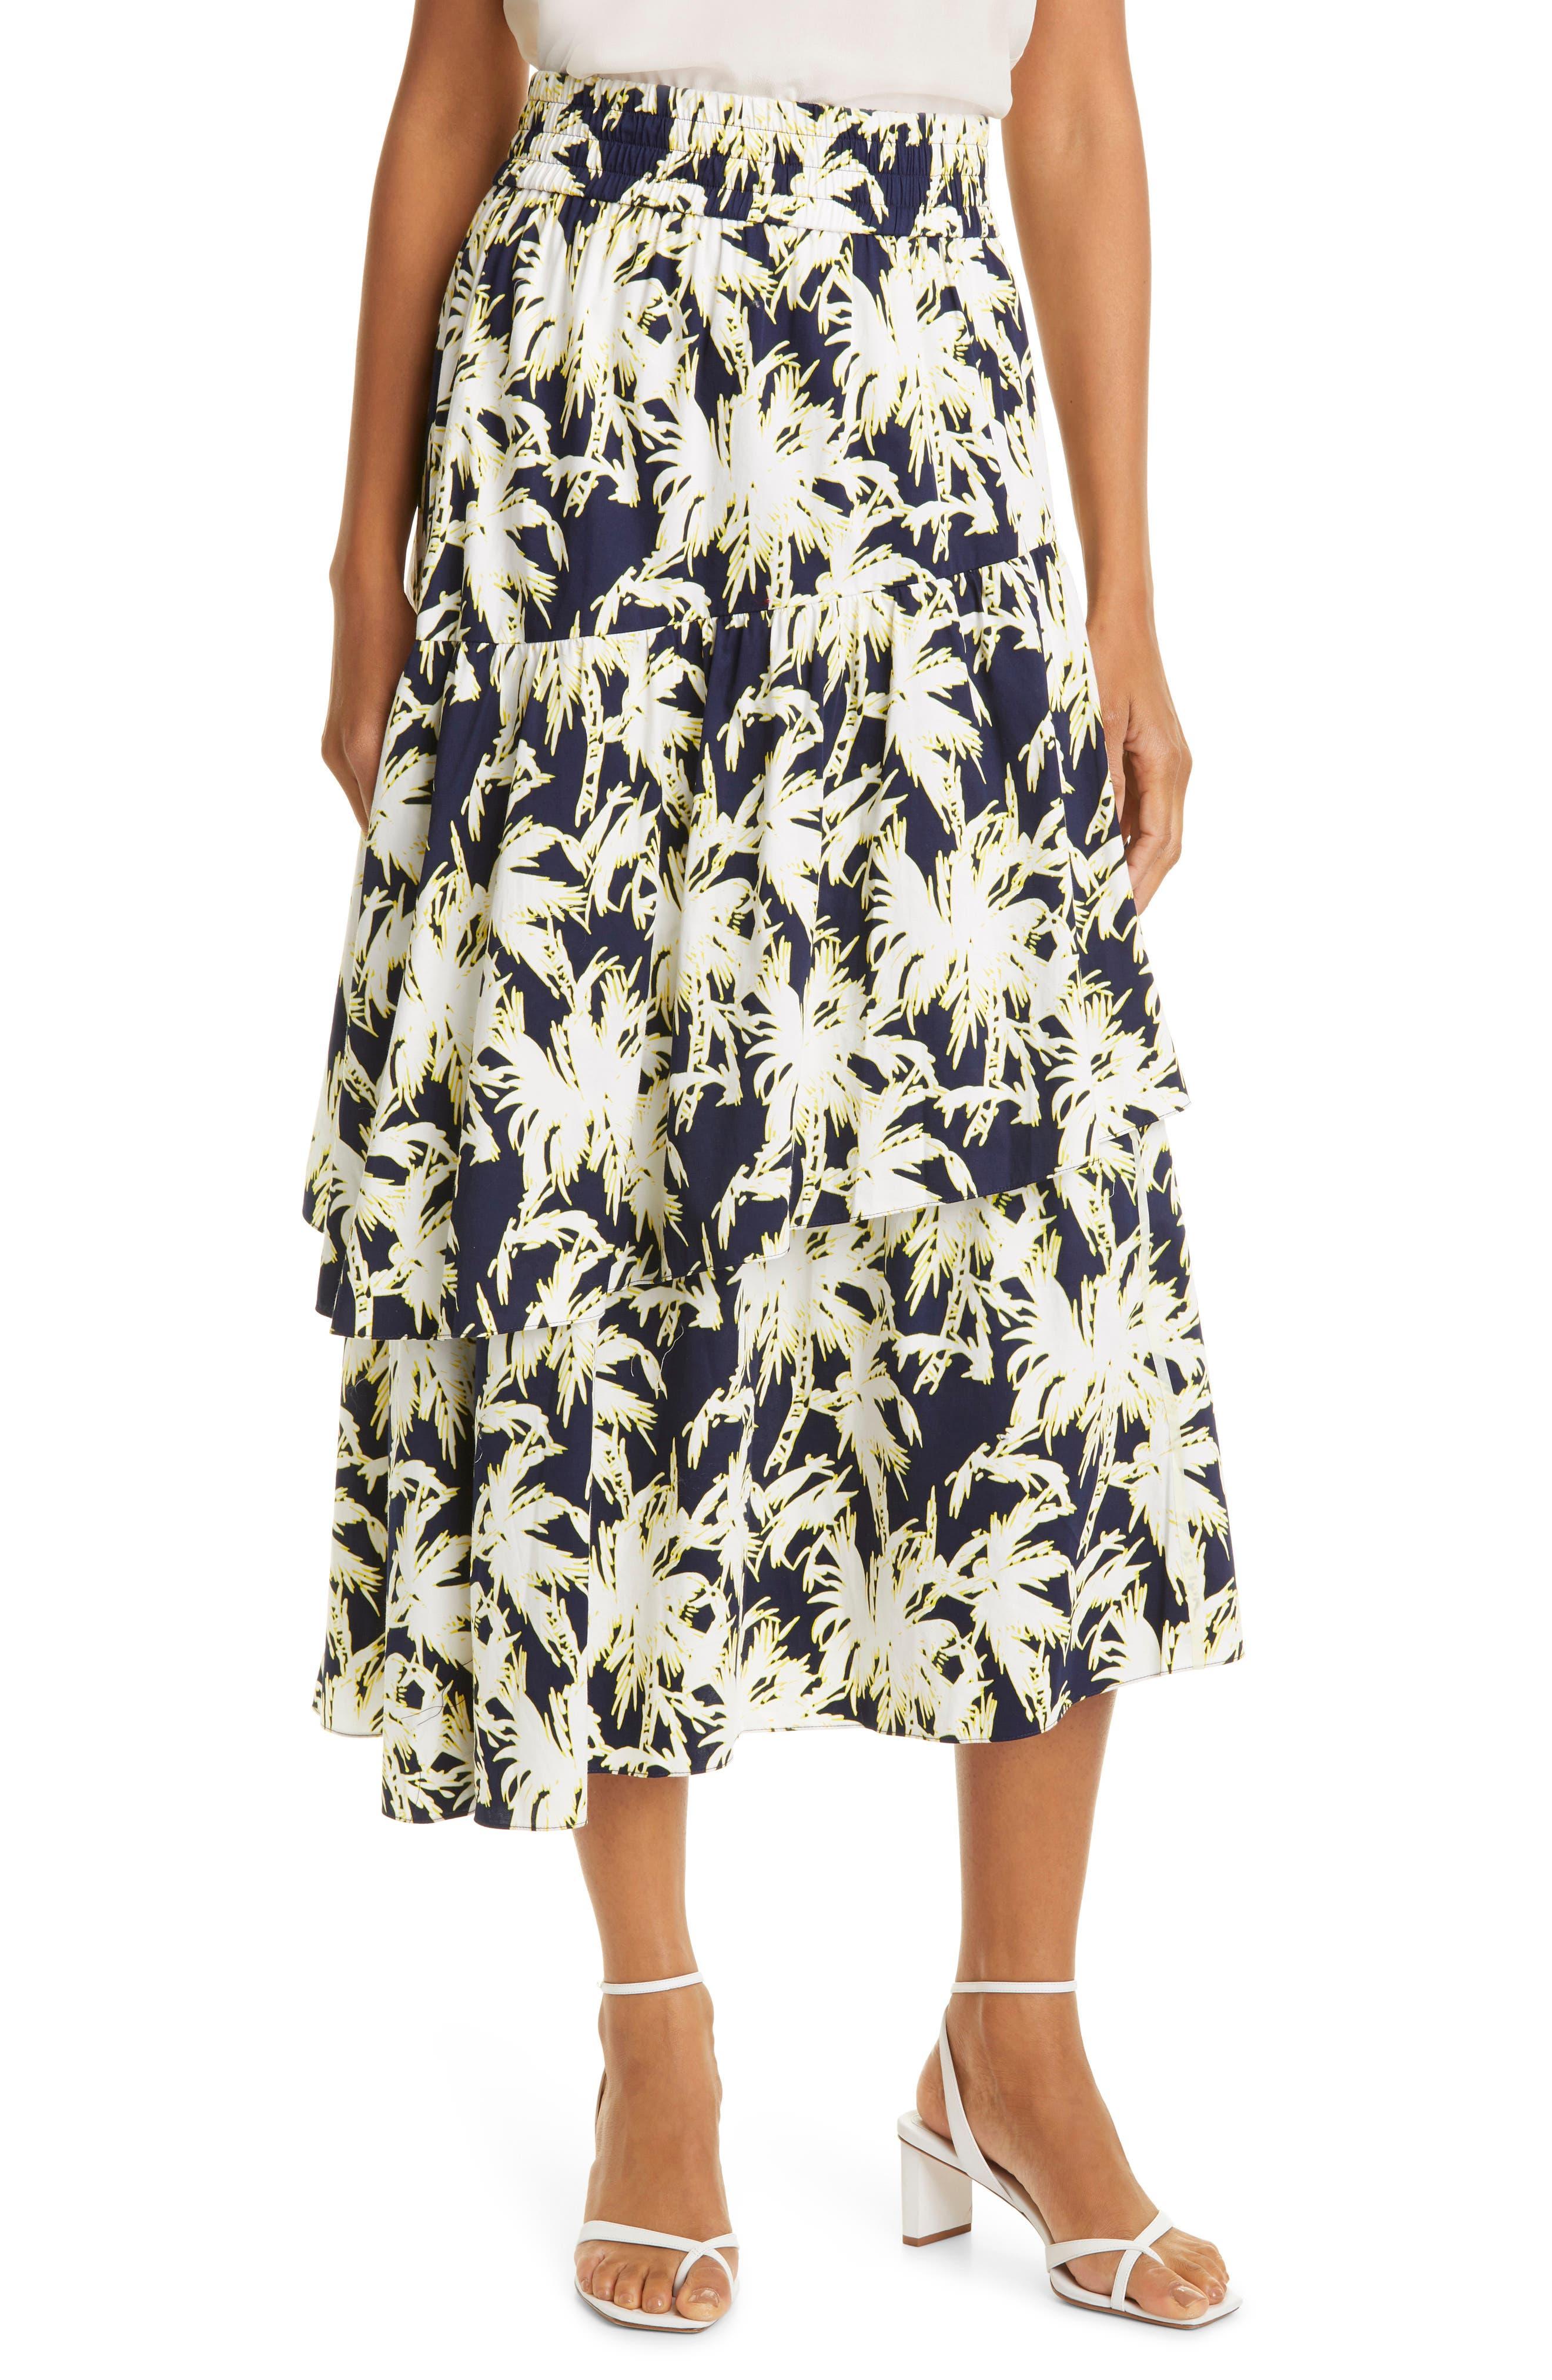 London Palm Tree Tiered Skirt